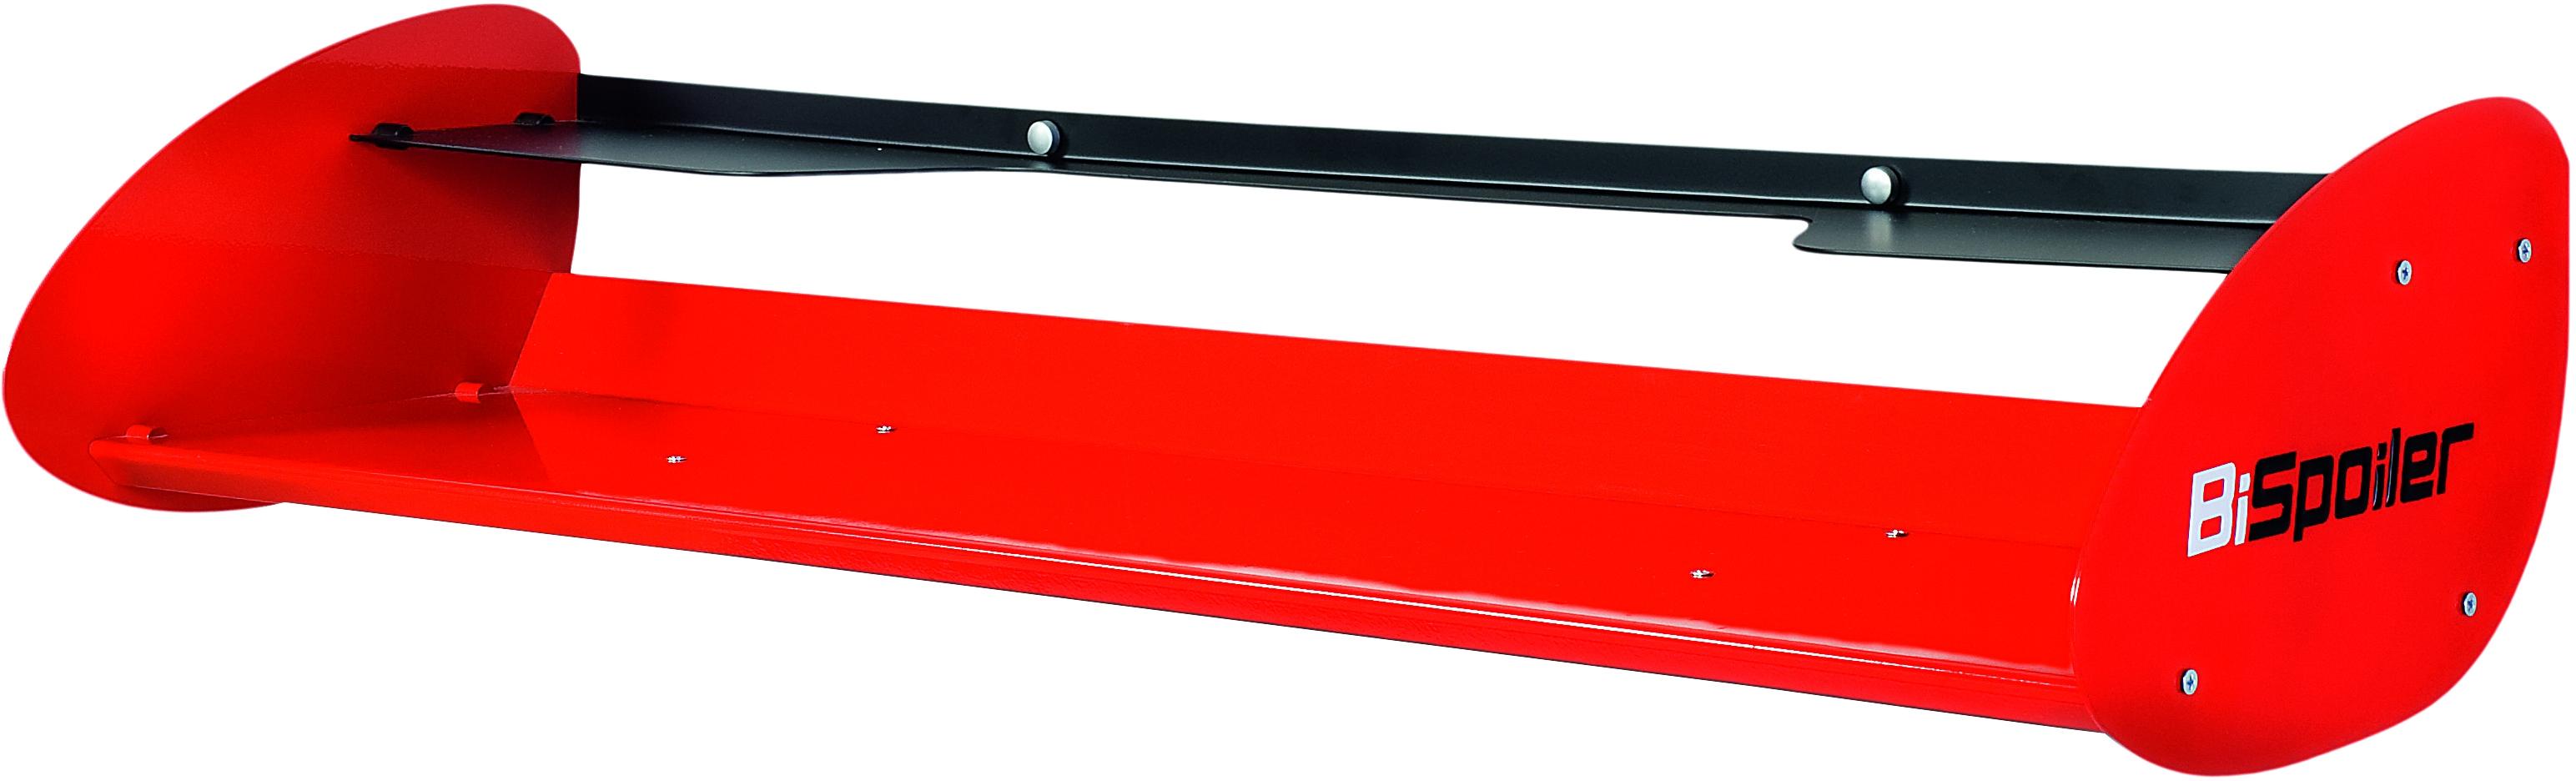 Etajera din pal si metal pentru copii Champion Racer Red / Grey l91xA29xH21 cm